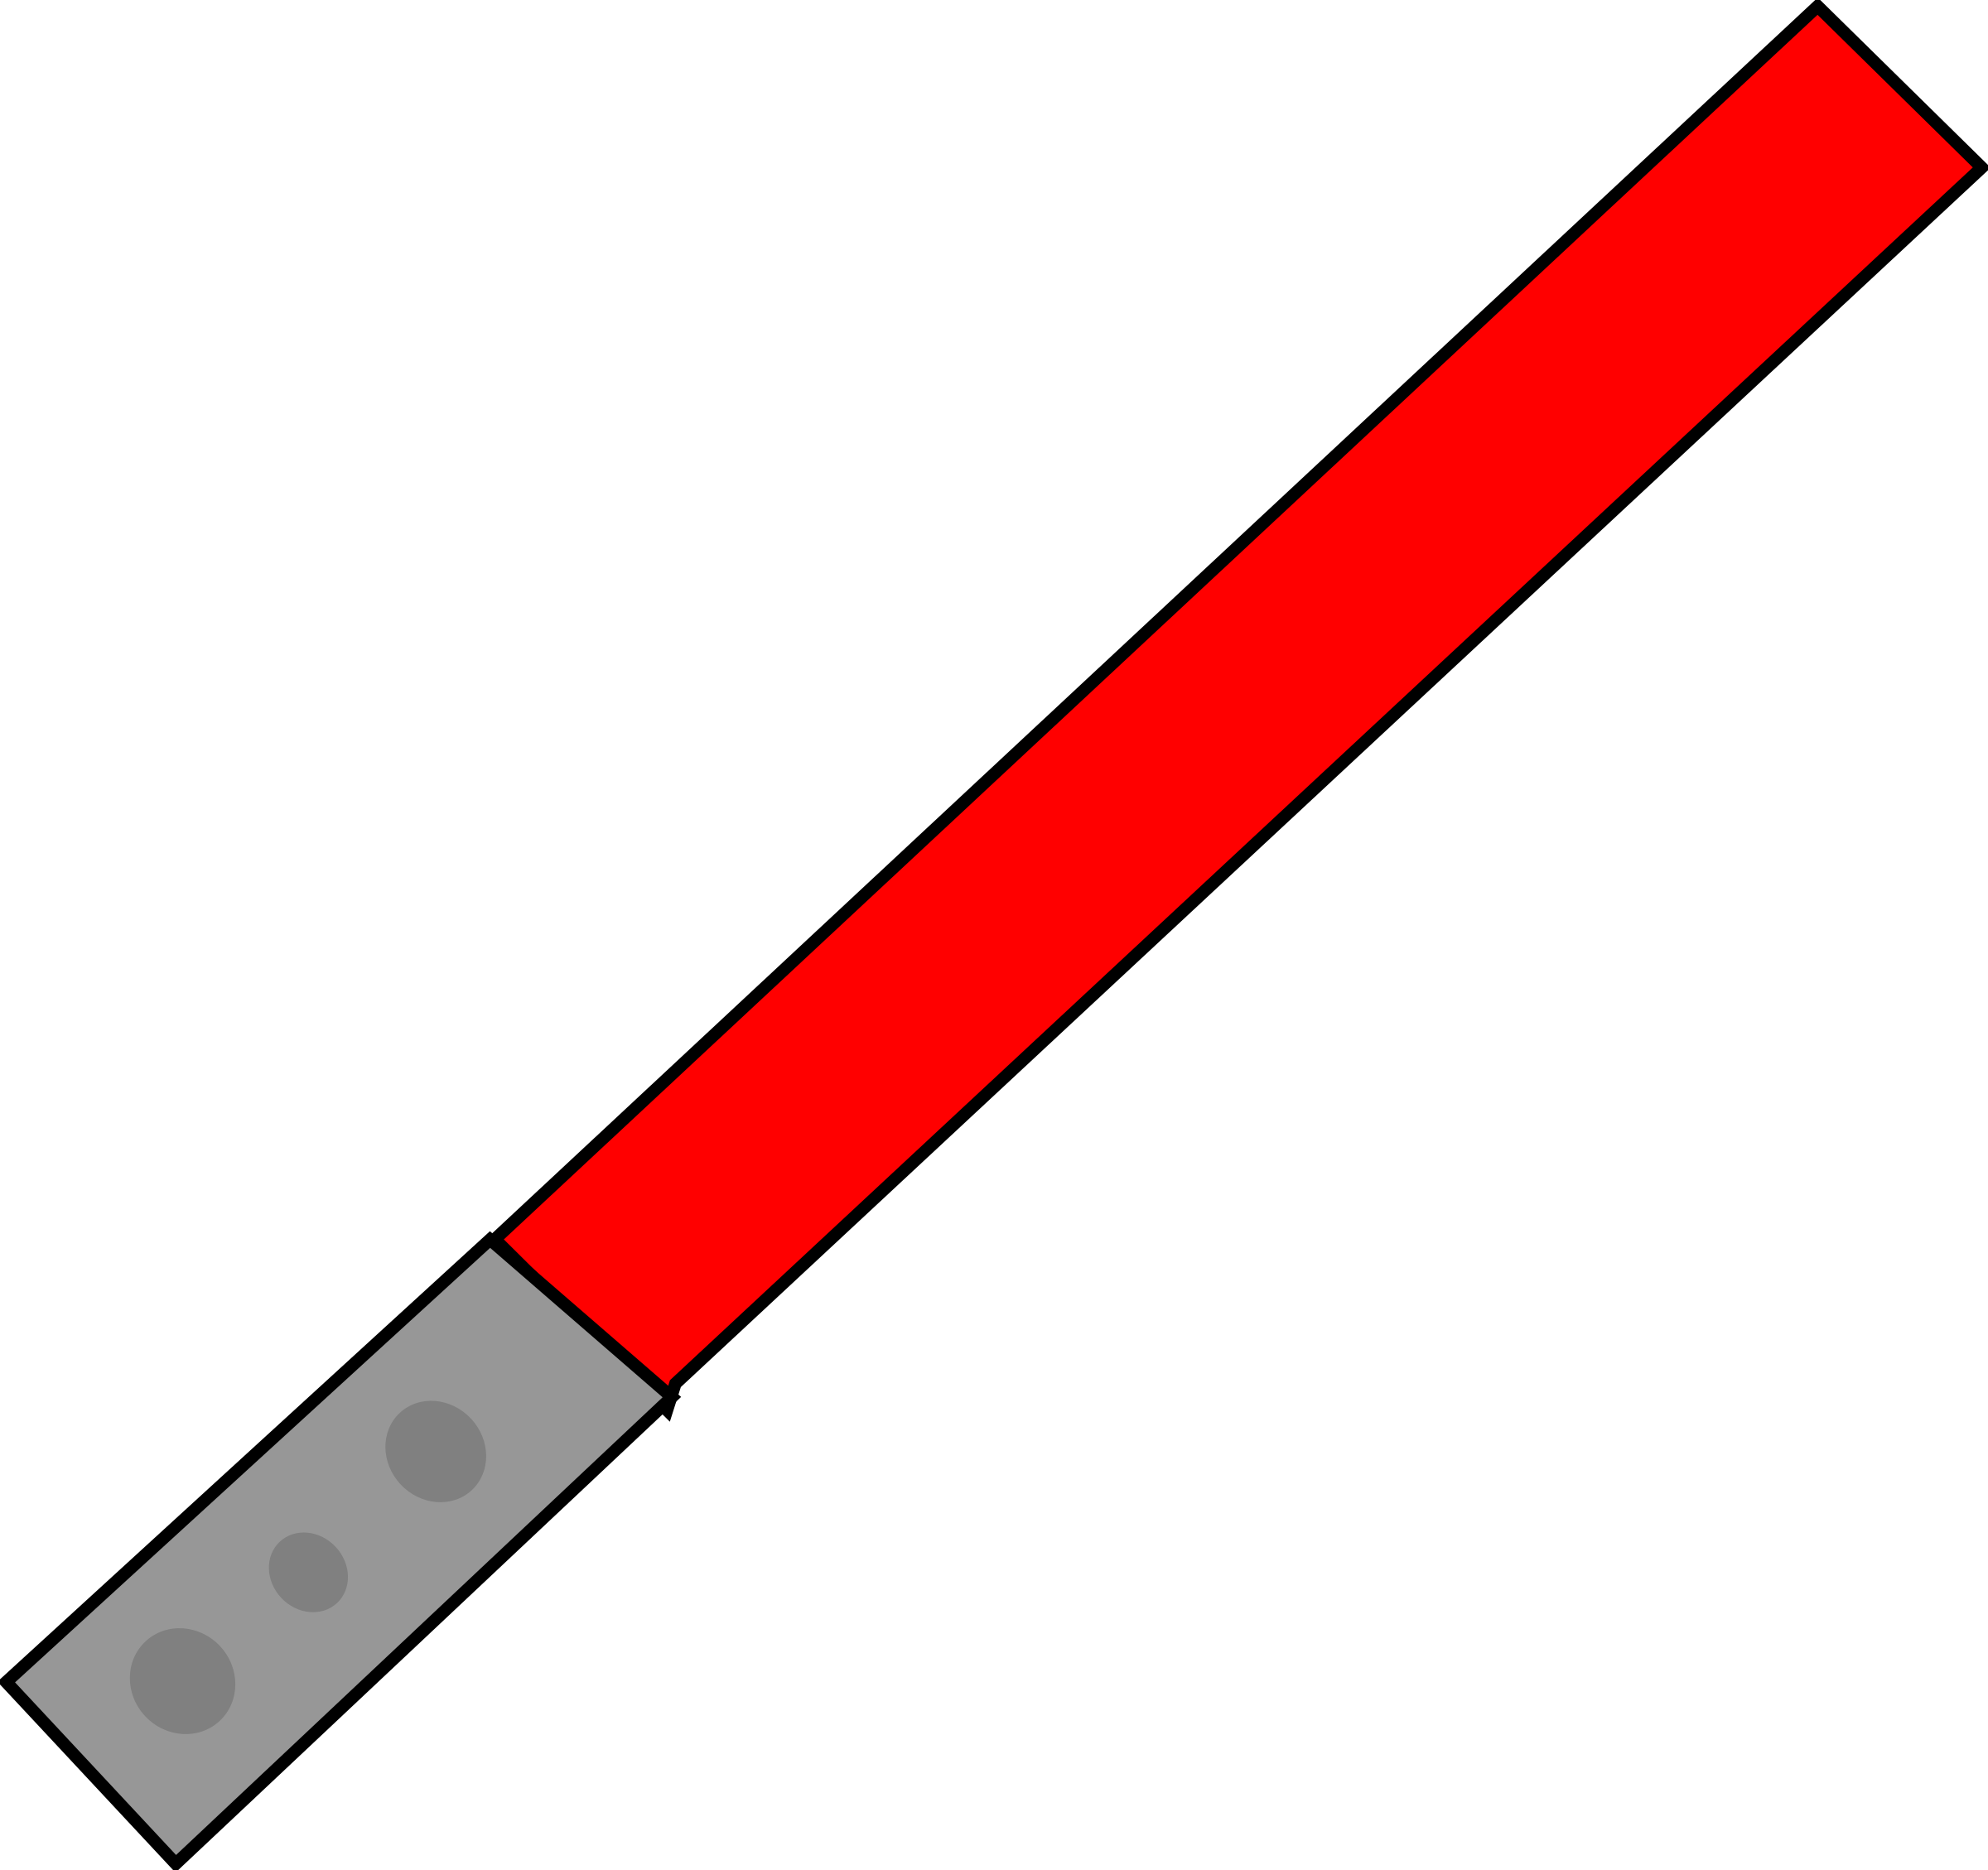 Star wars light saber clipart vector black and white library Clipart - Red Light Saber vector black and white library